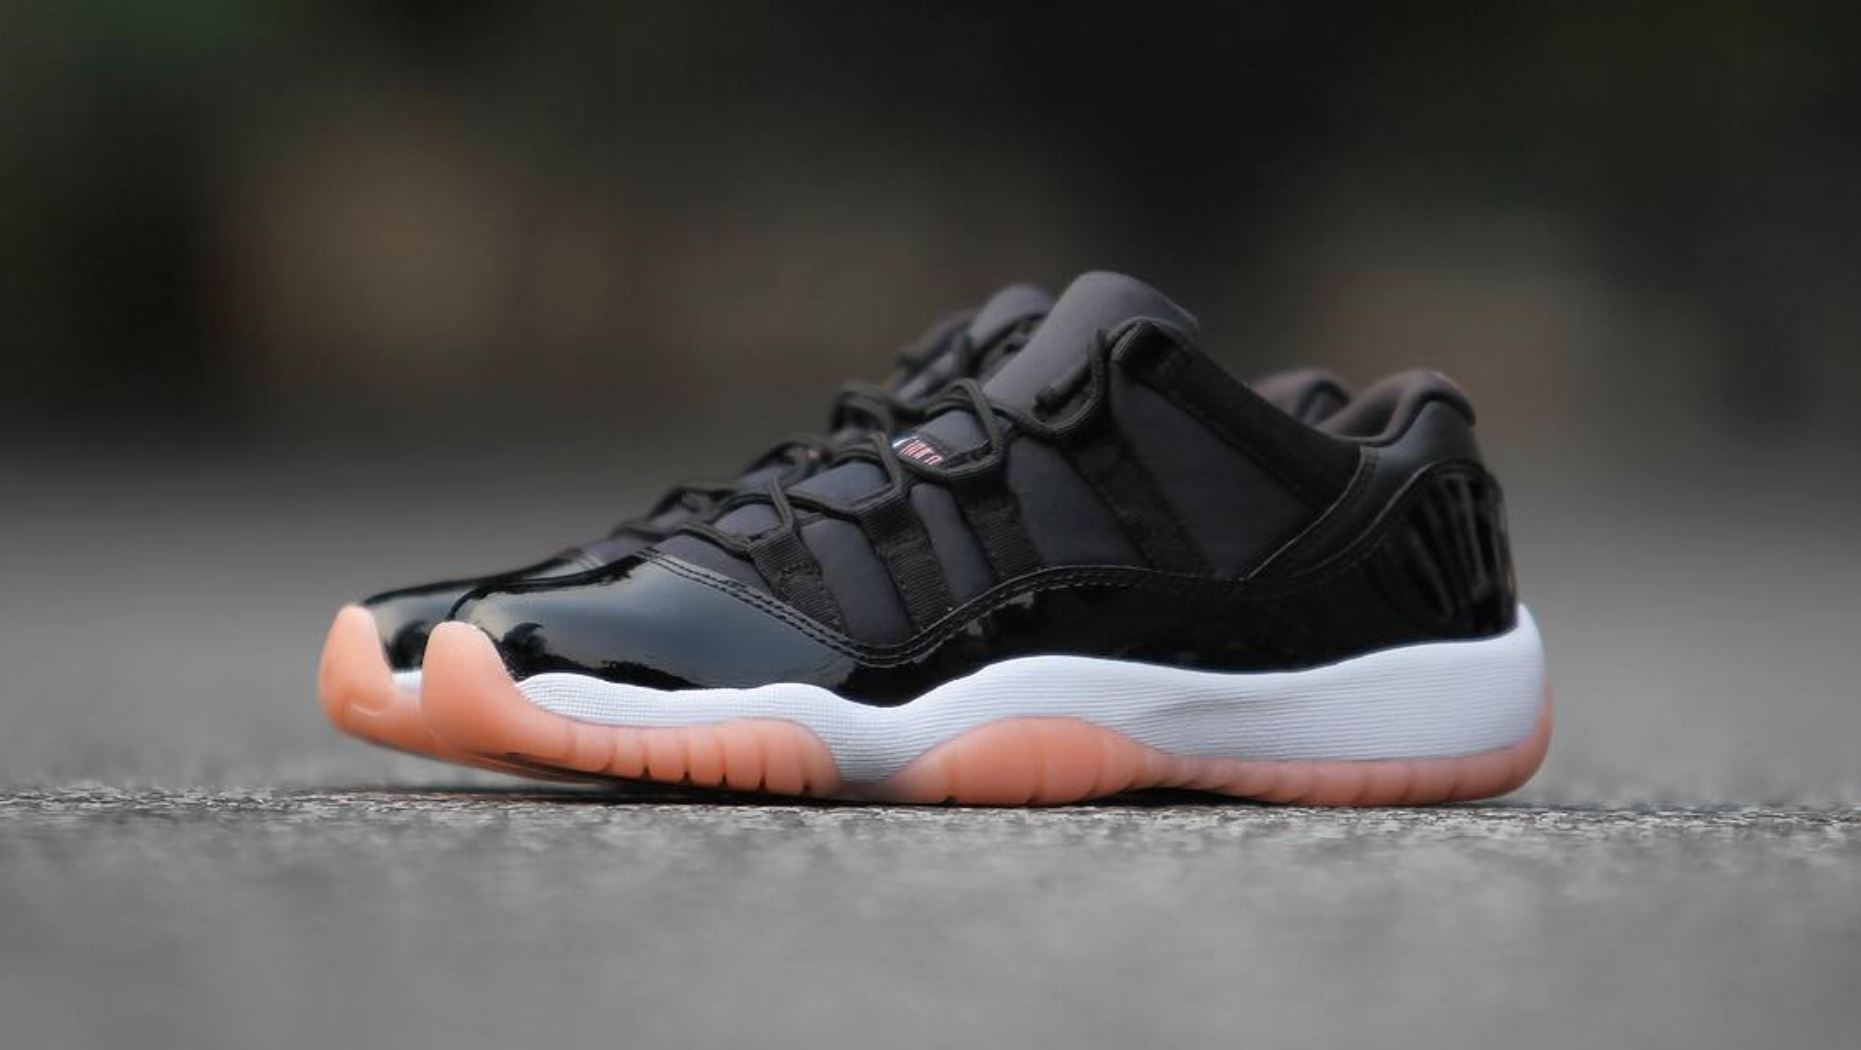 The Air Jordan 11 Low 'Bleached Coral